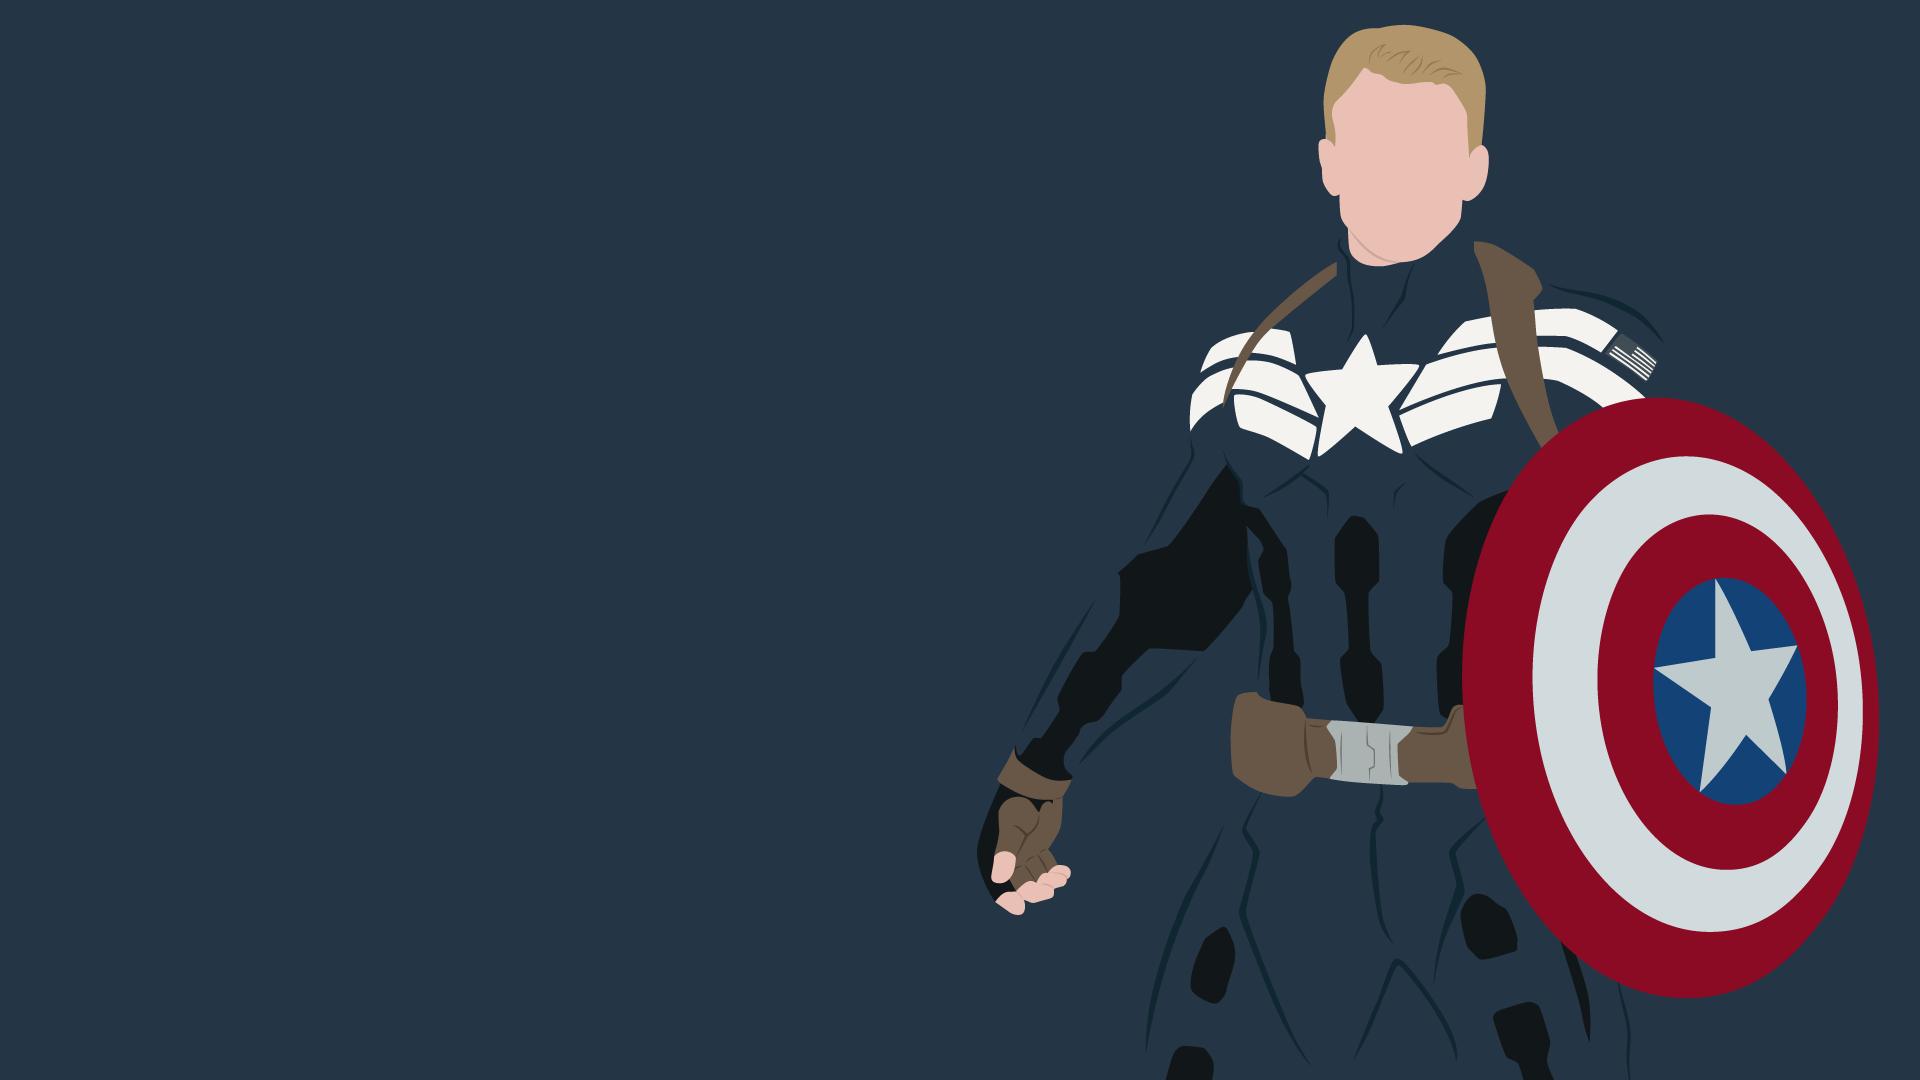 Download Captain America Wallpaper For Iphone Ipad